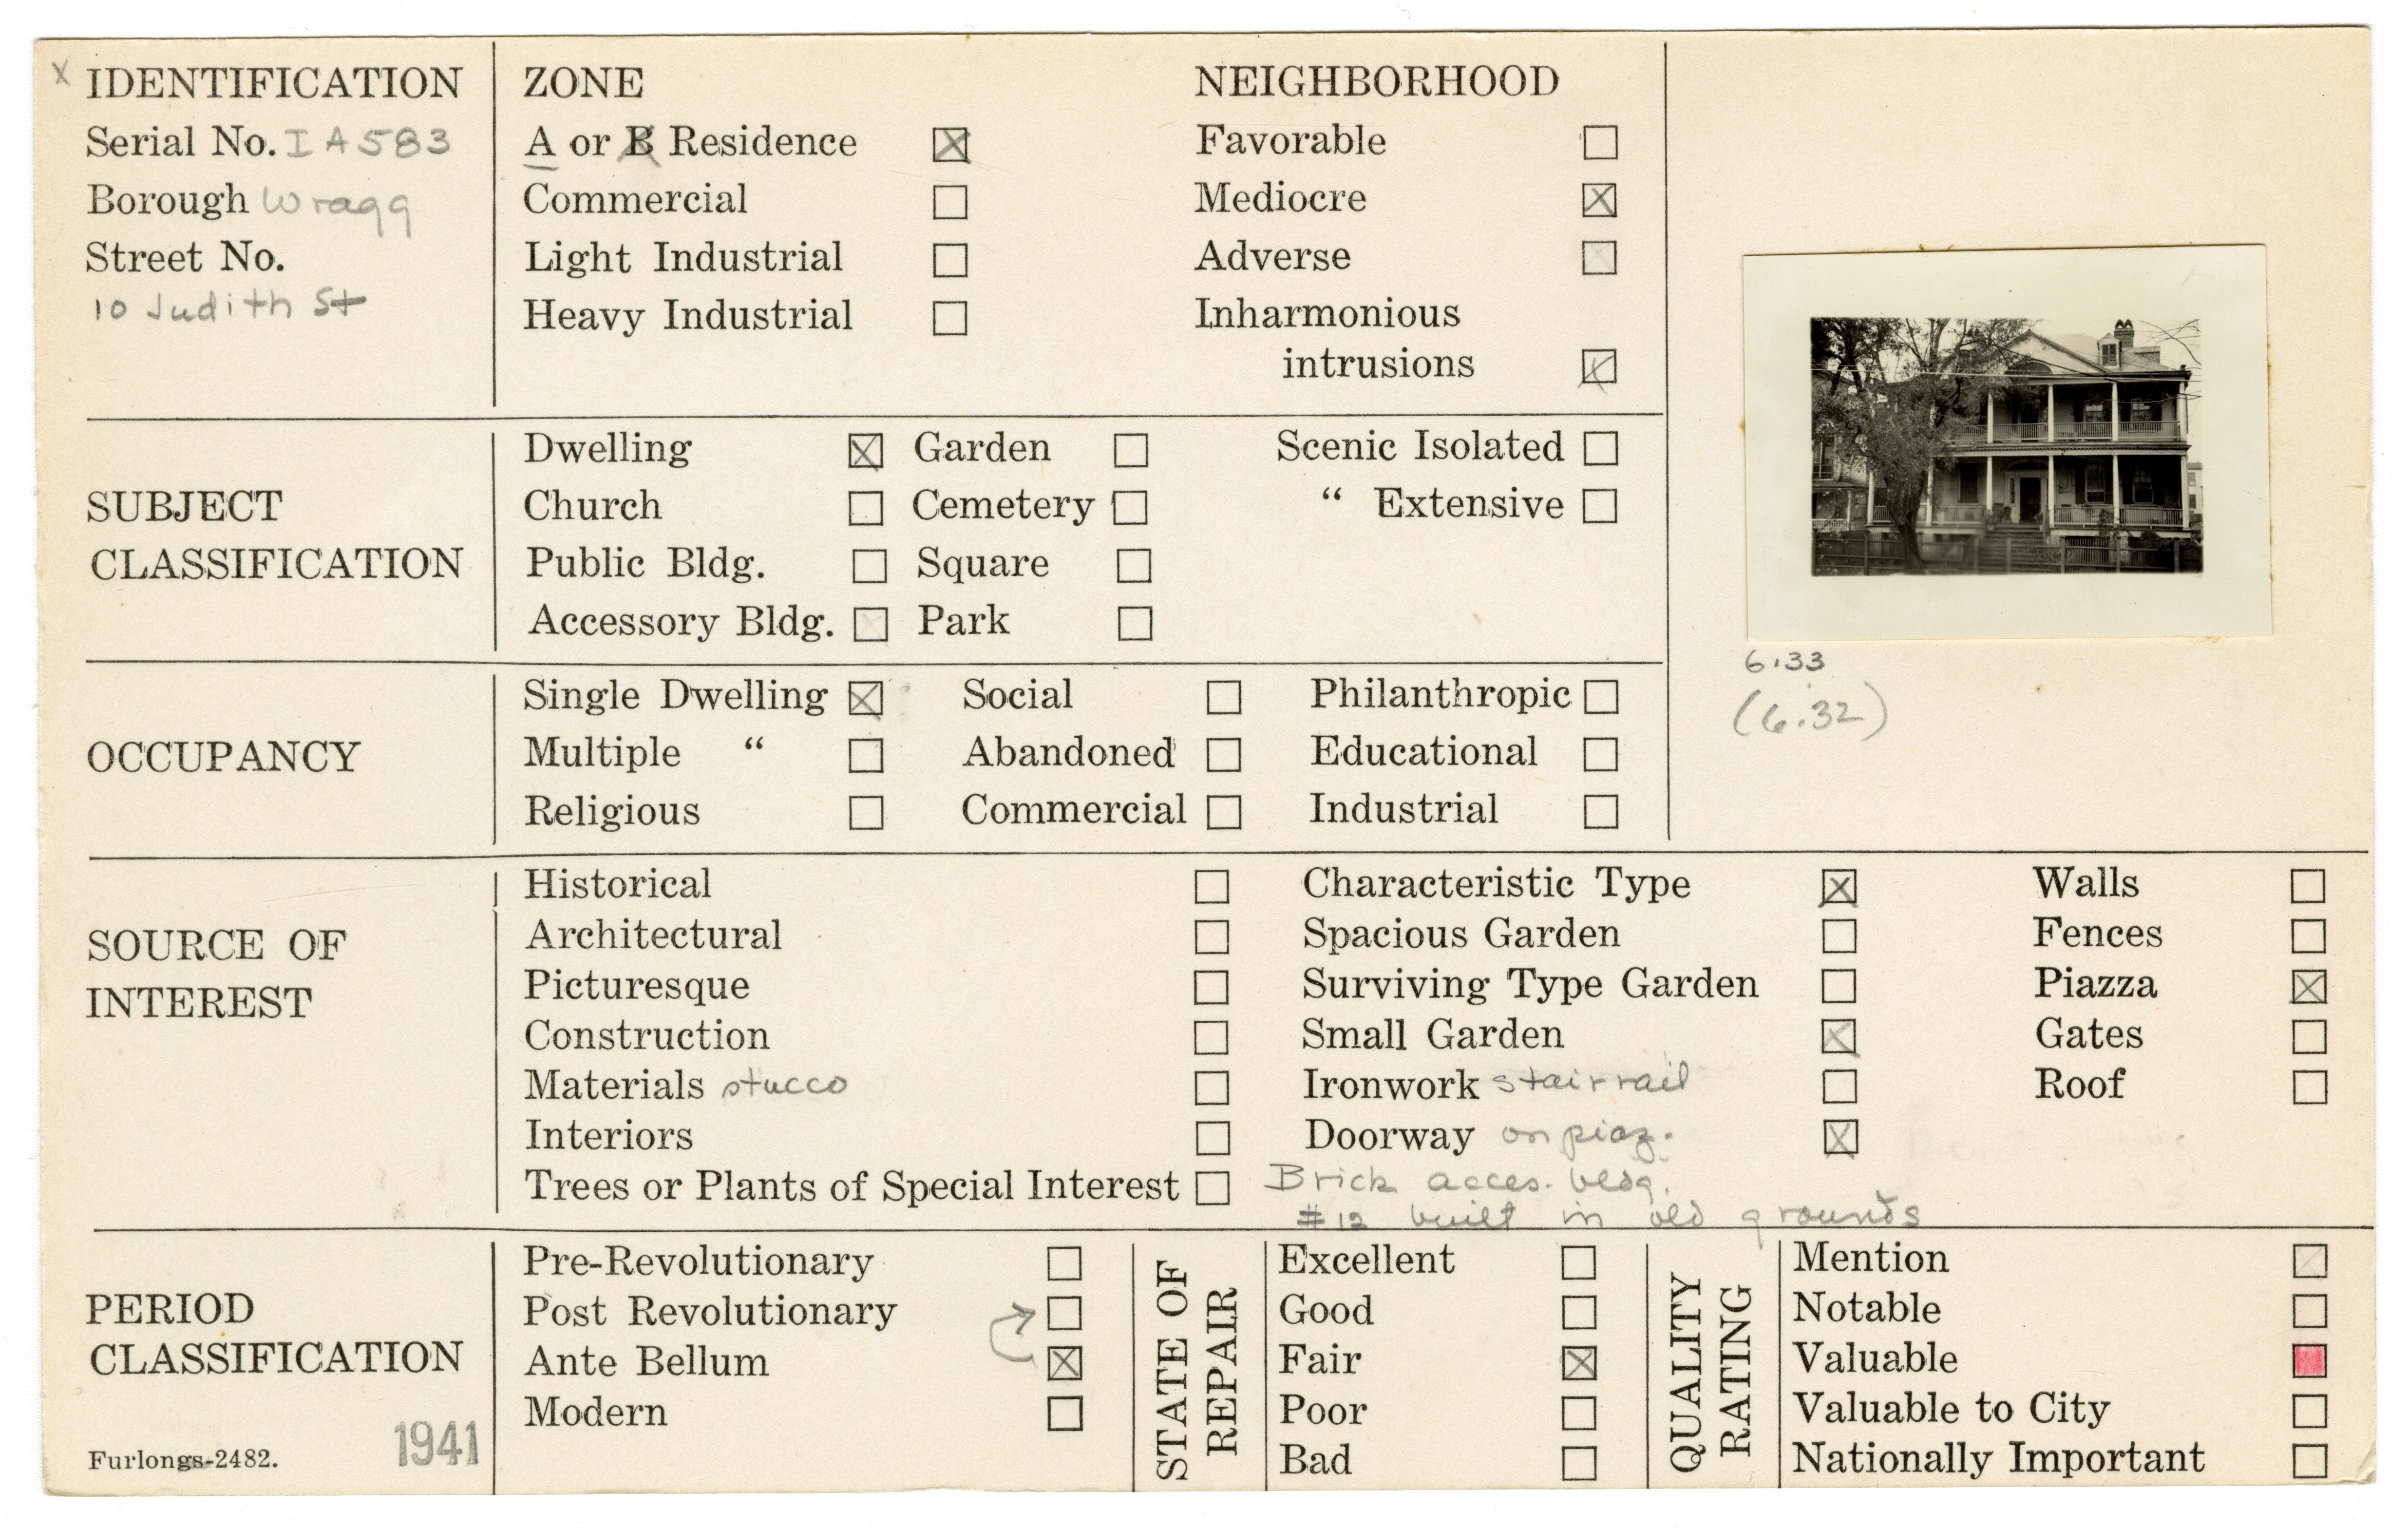 Index Card Survey of 10 Judith Street